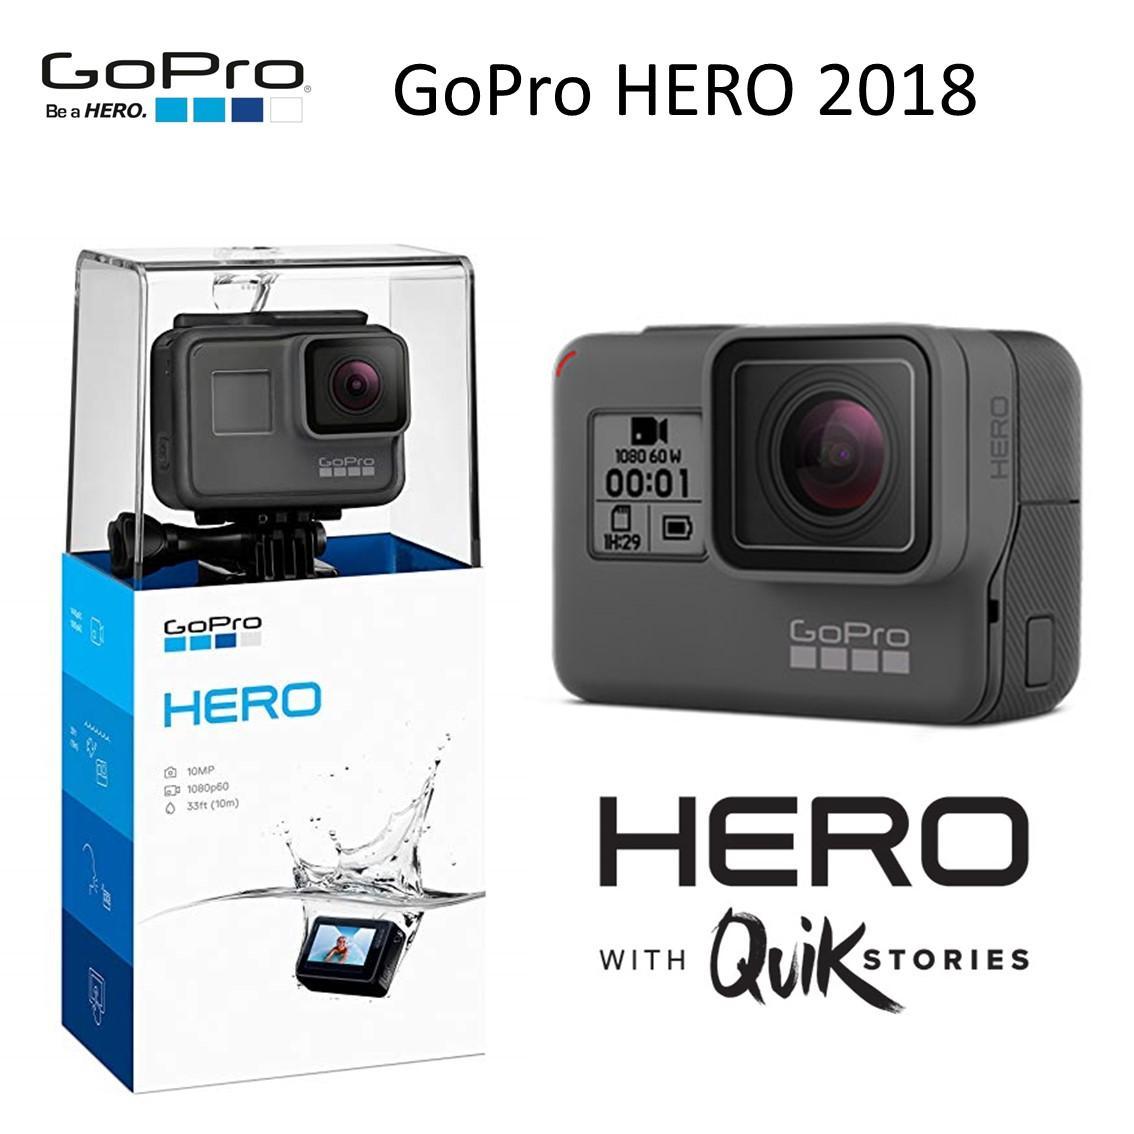 Buy Sports Camera Online Action Lazada Sport Cam Full Hd Dv 1080p Sj4000 Waterproof 12mp Kogan Gopro Hero 2018 With Quik Stories